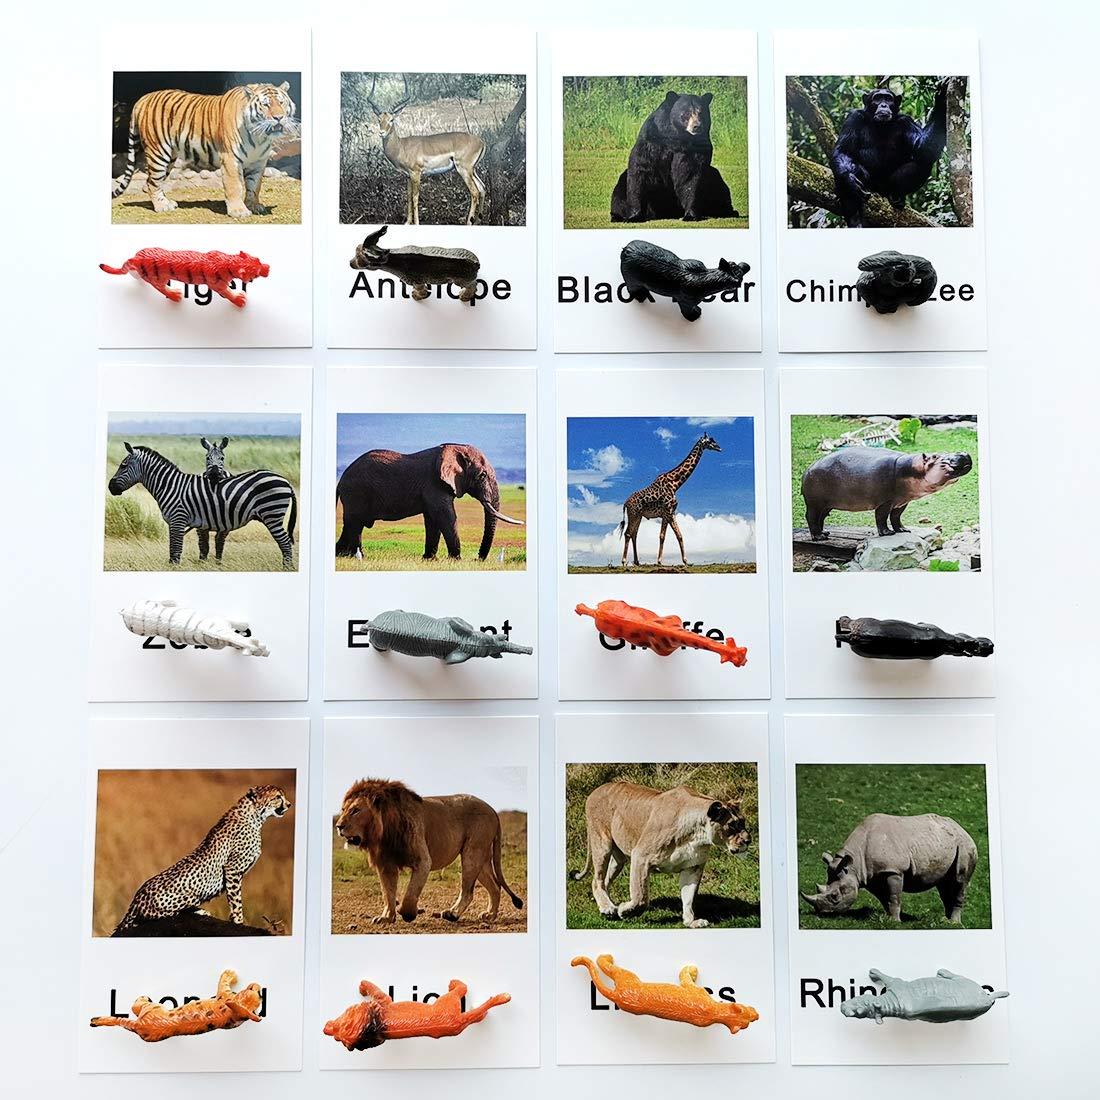 Montessori Zoo Safari Animal Match - Miniature Figurines with 2 Part Matching Cards Montessori Language Materials Preschool Learning Toy NEWTT004